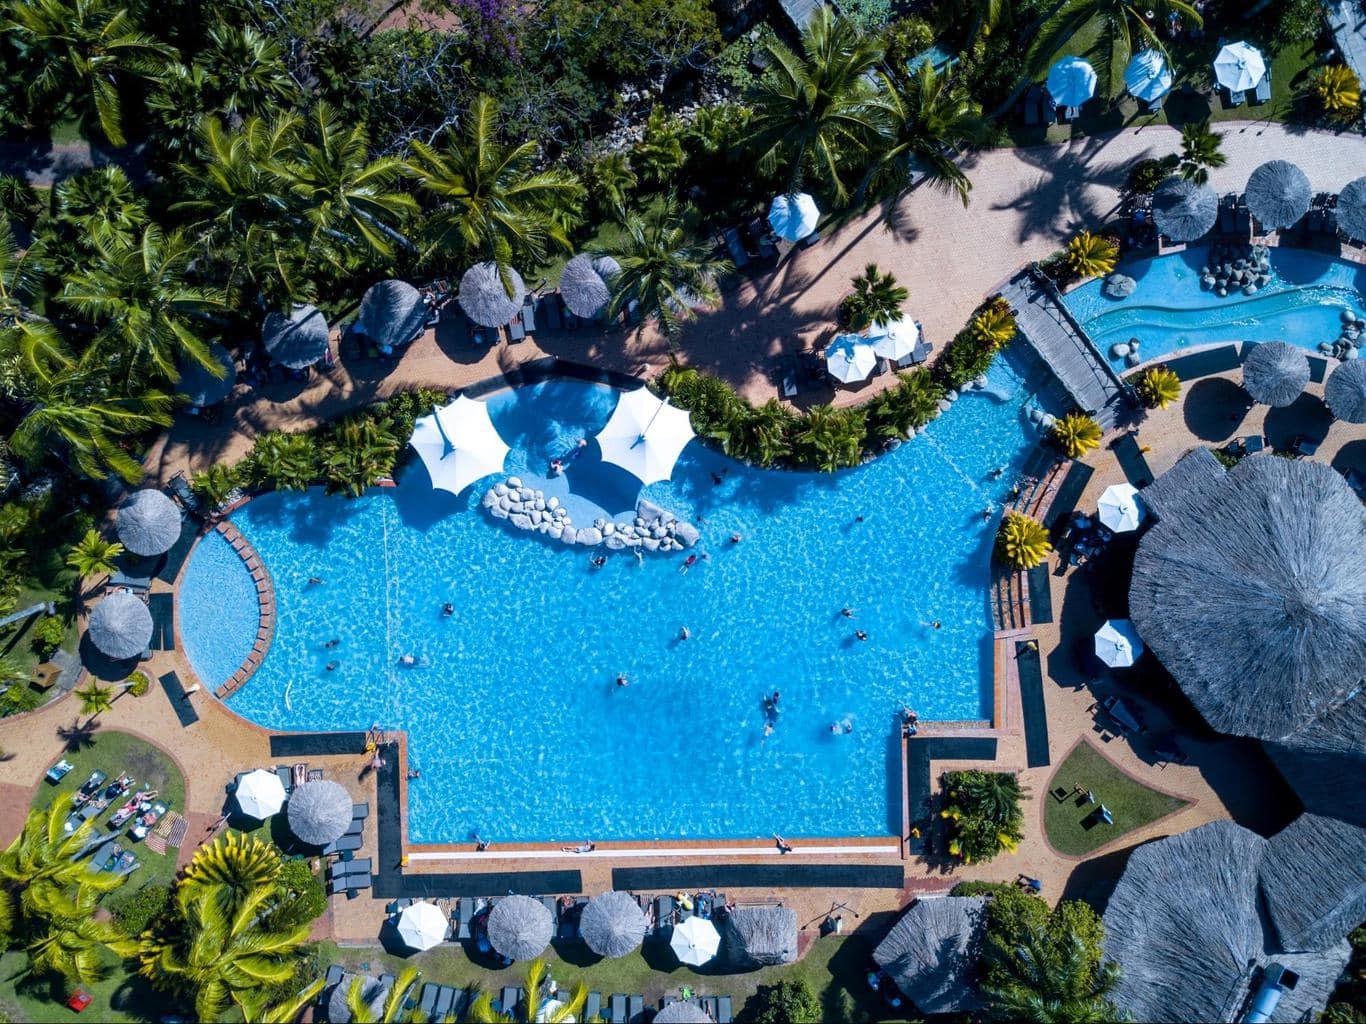 The main pool at Outrigger Fiji Beach Resort